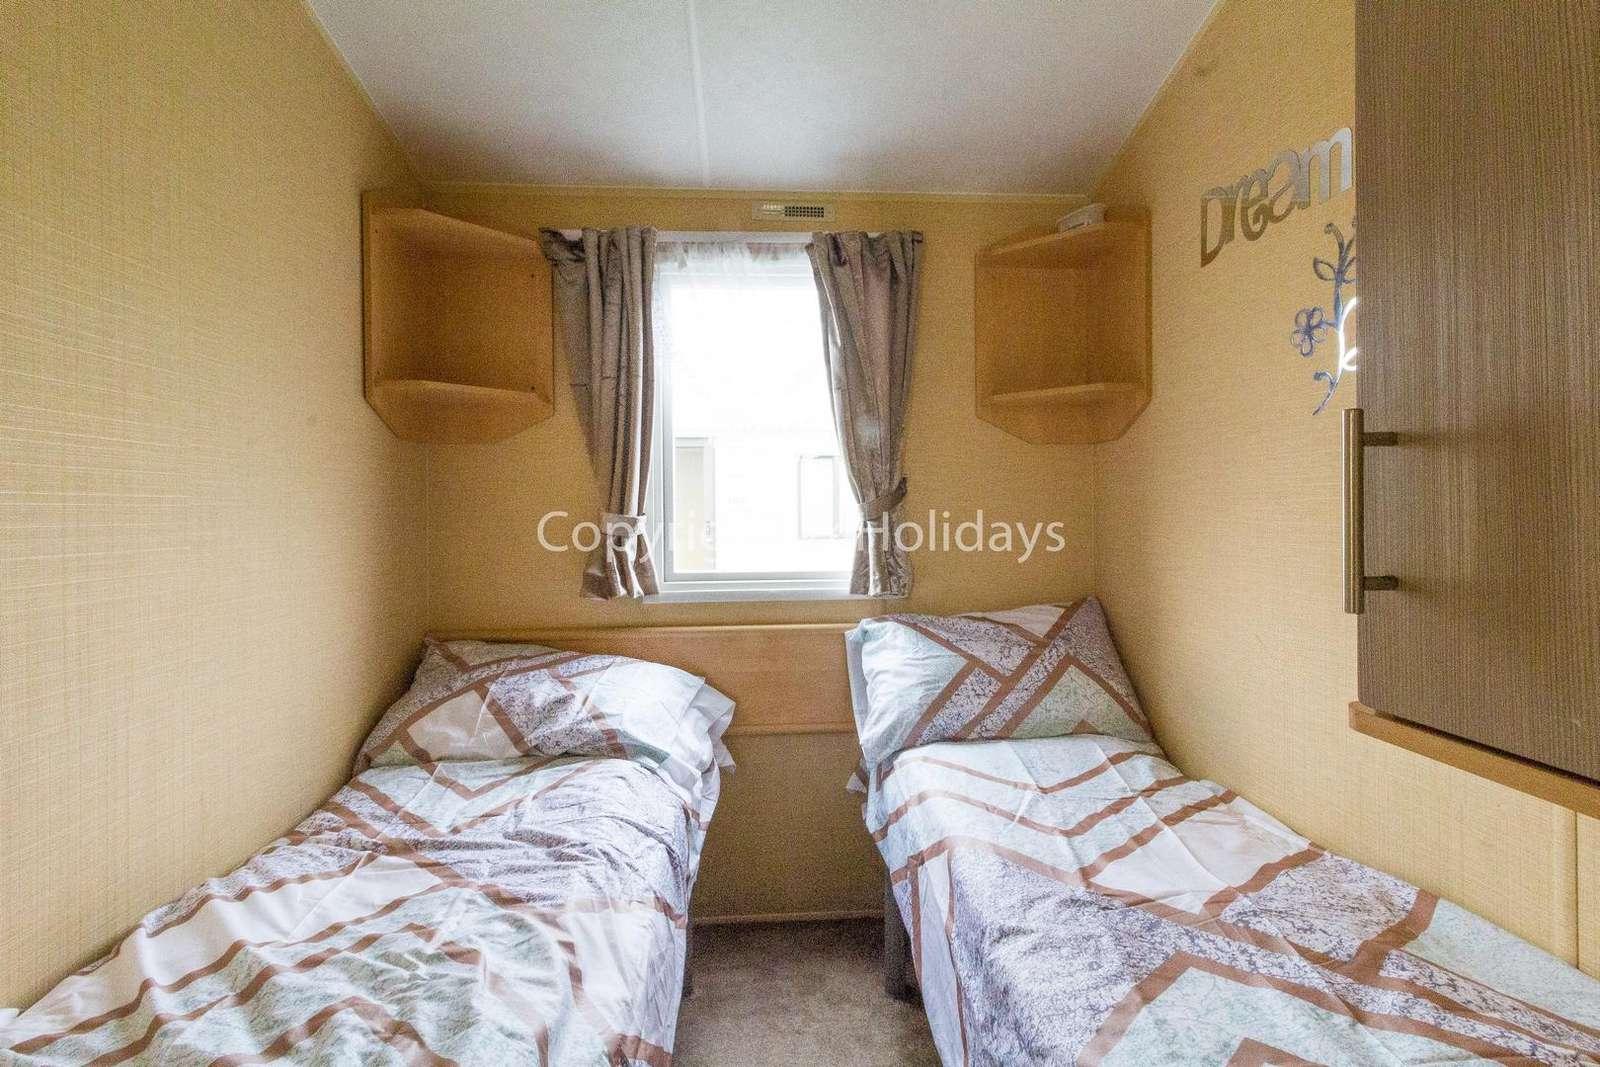 Great pet friendly accommodation